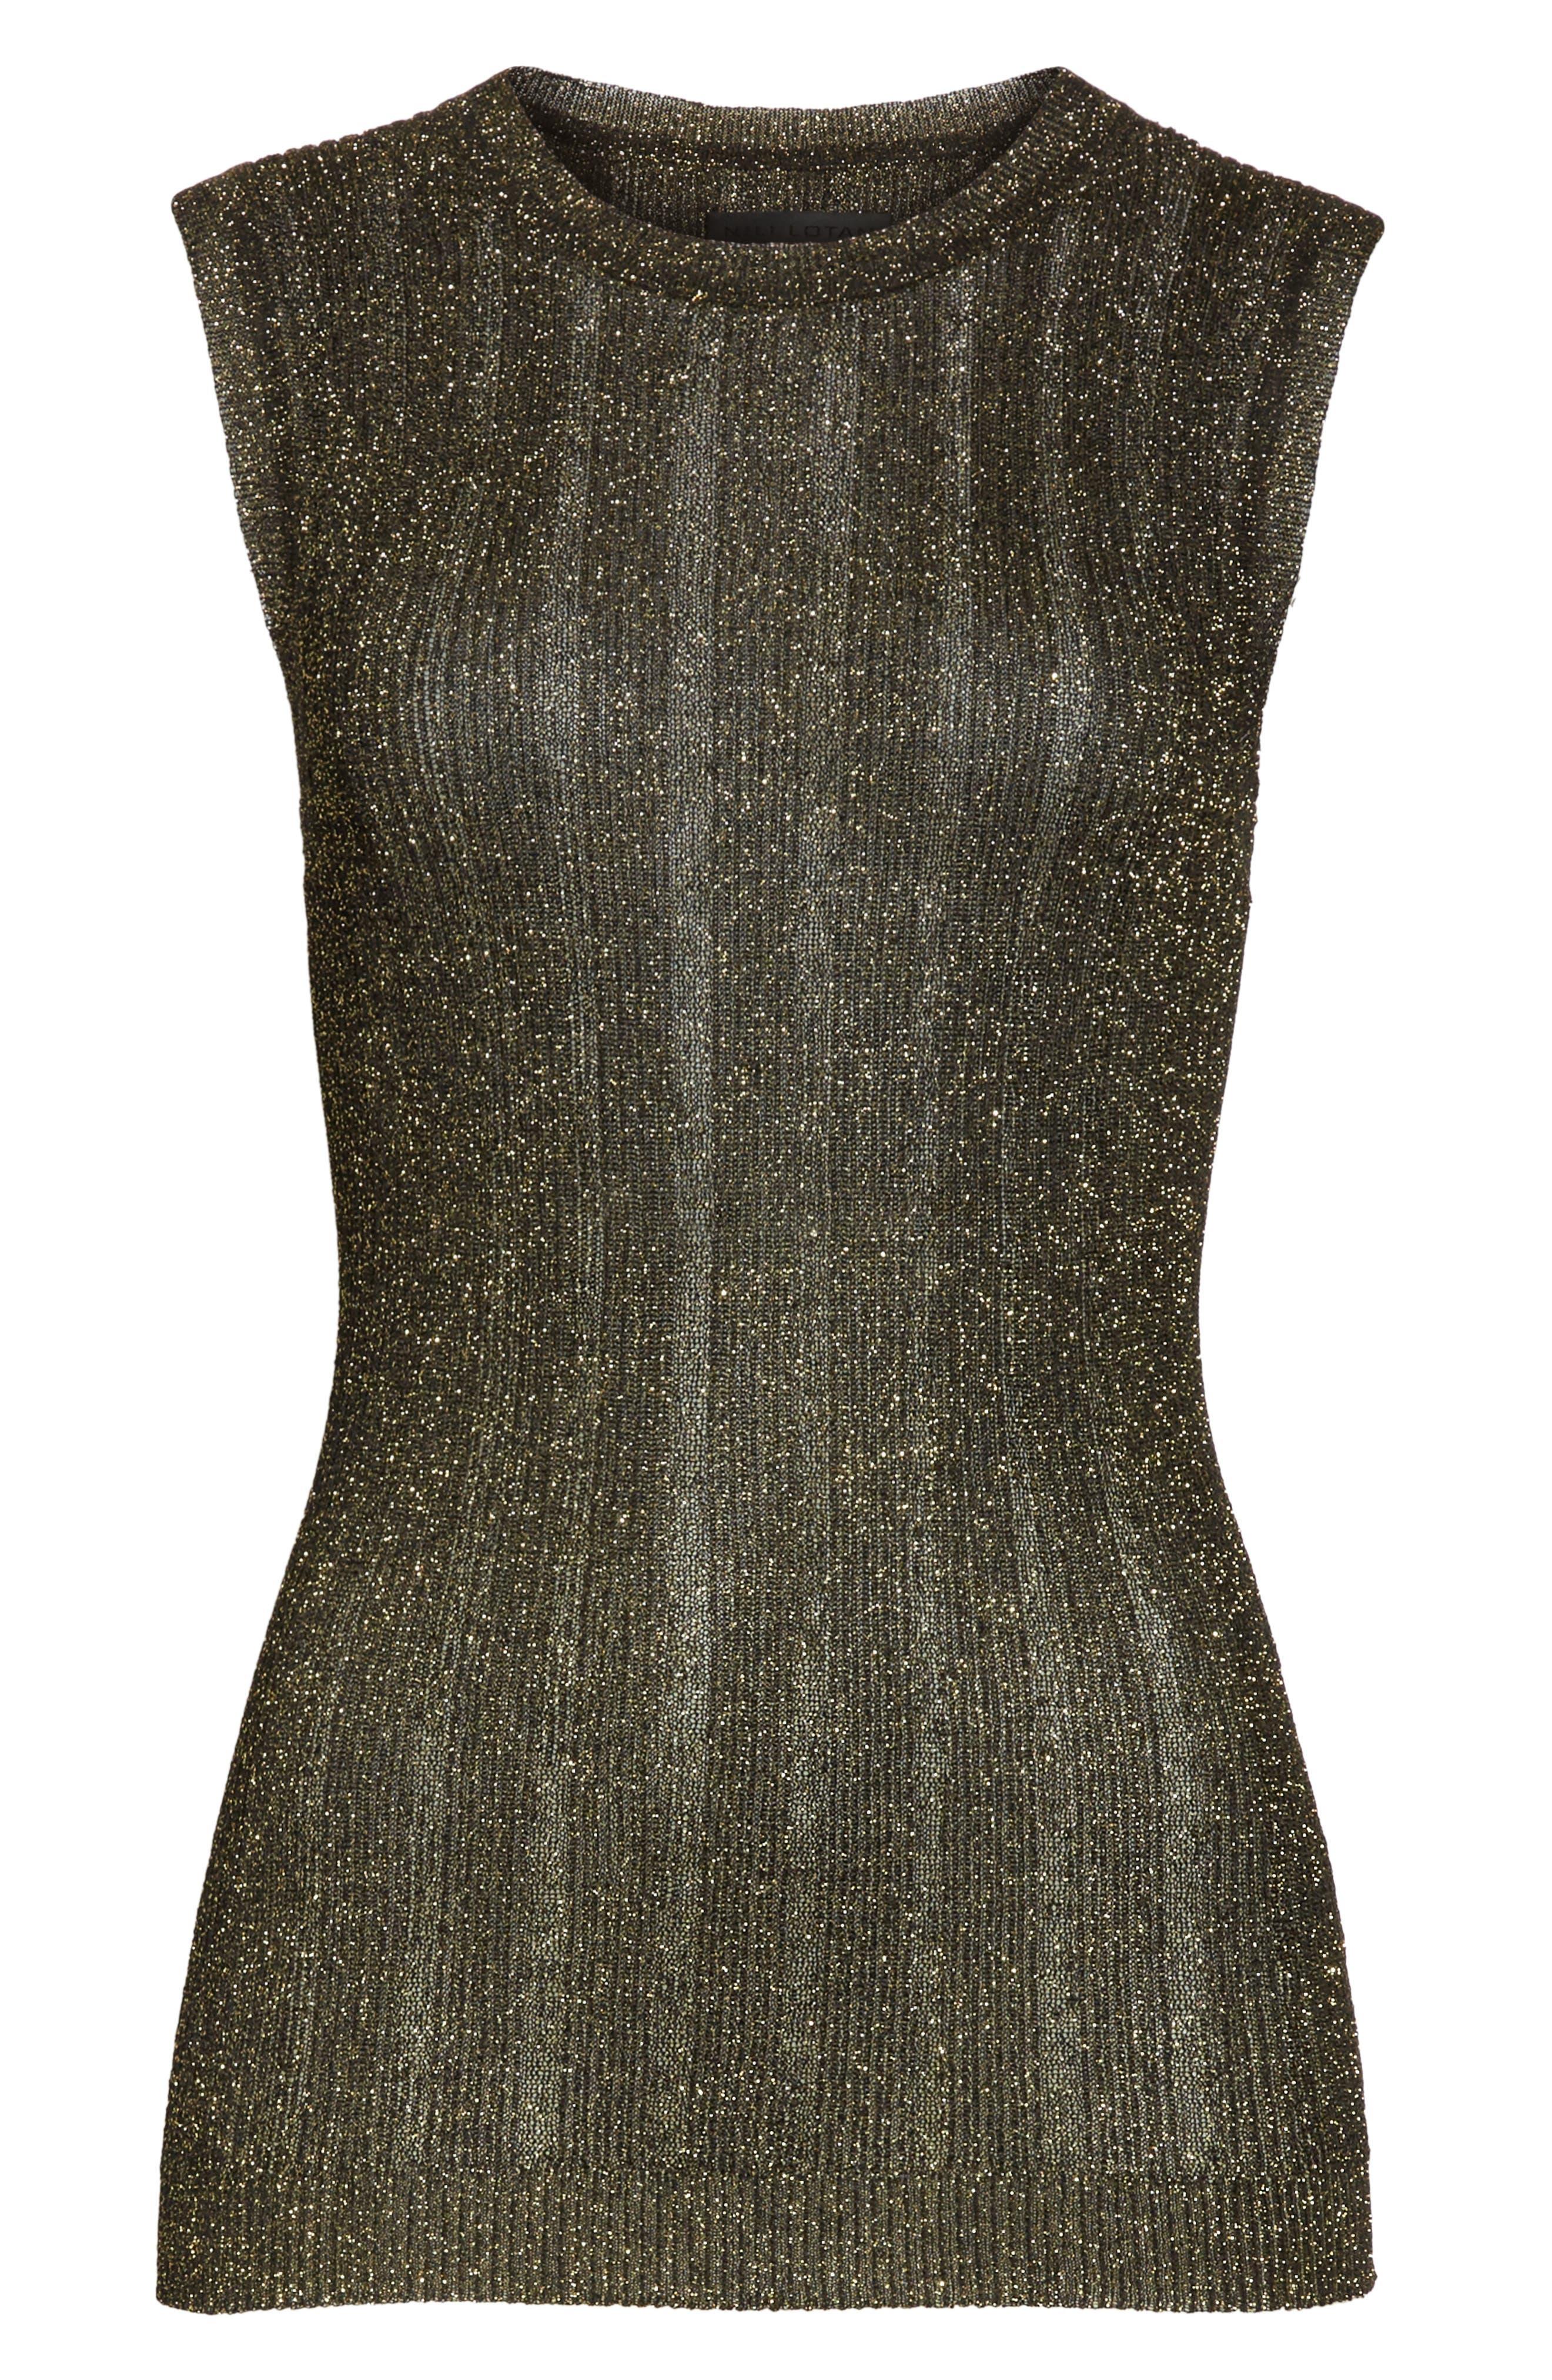 Lace Metallic Knit Top,                             Alternate thumbnail 6, color,                             011